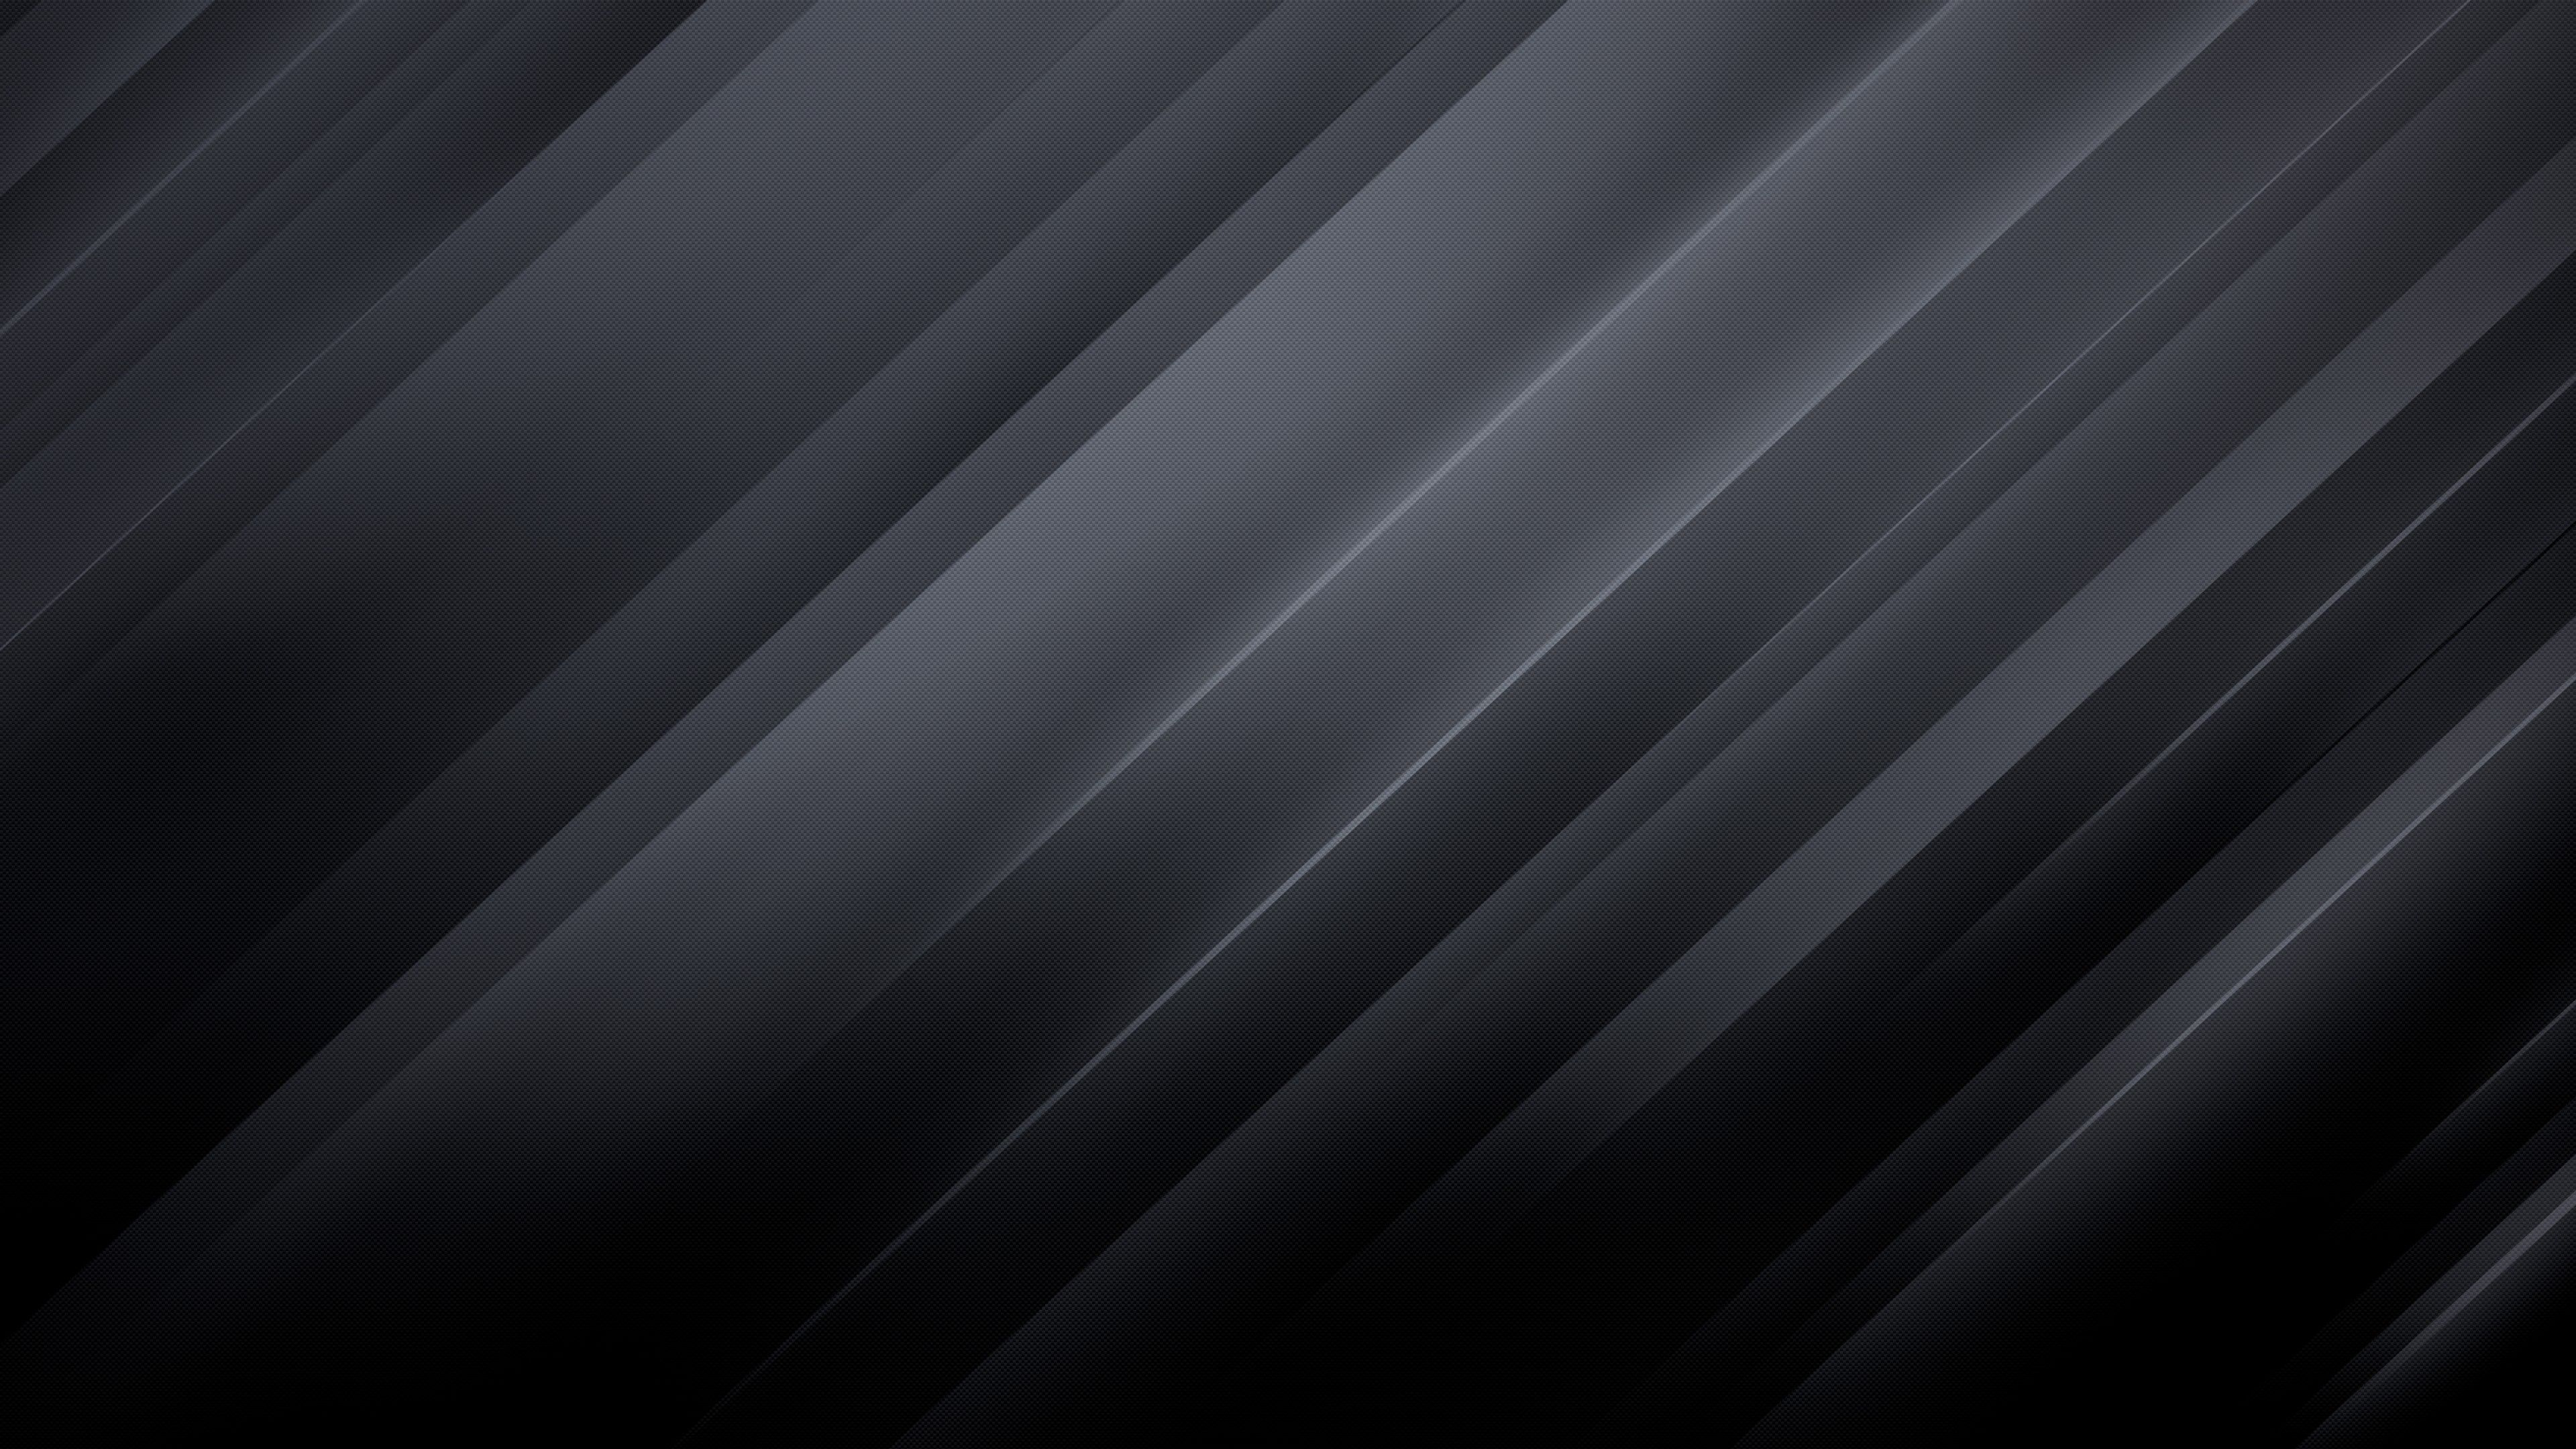 Minimalist Black Wallpapers - Top Free Minimalist Black ...